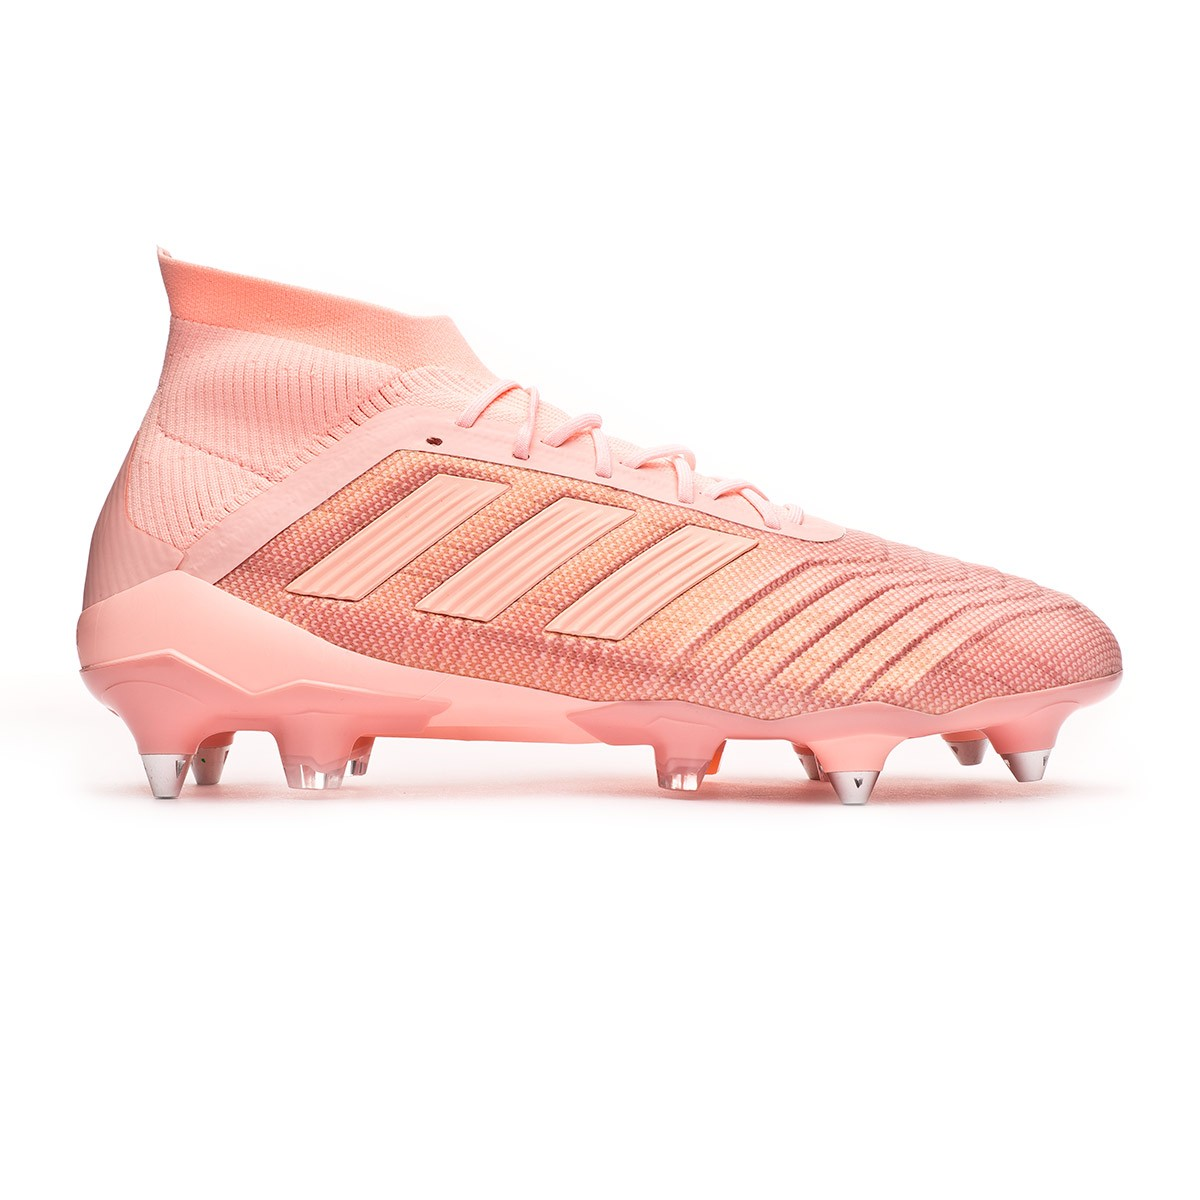 d02027db3 Football Boots adidas Predator 18.1 SG Clear orange-Trace pink - Football  store Fútbol Emotion